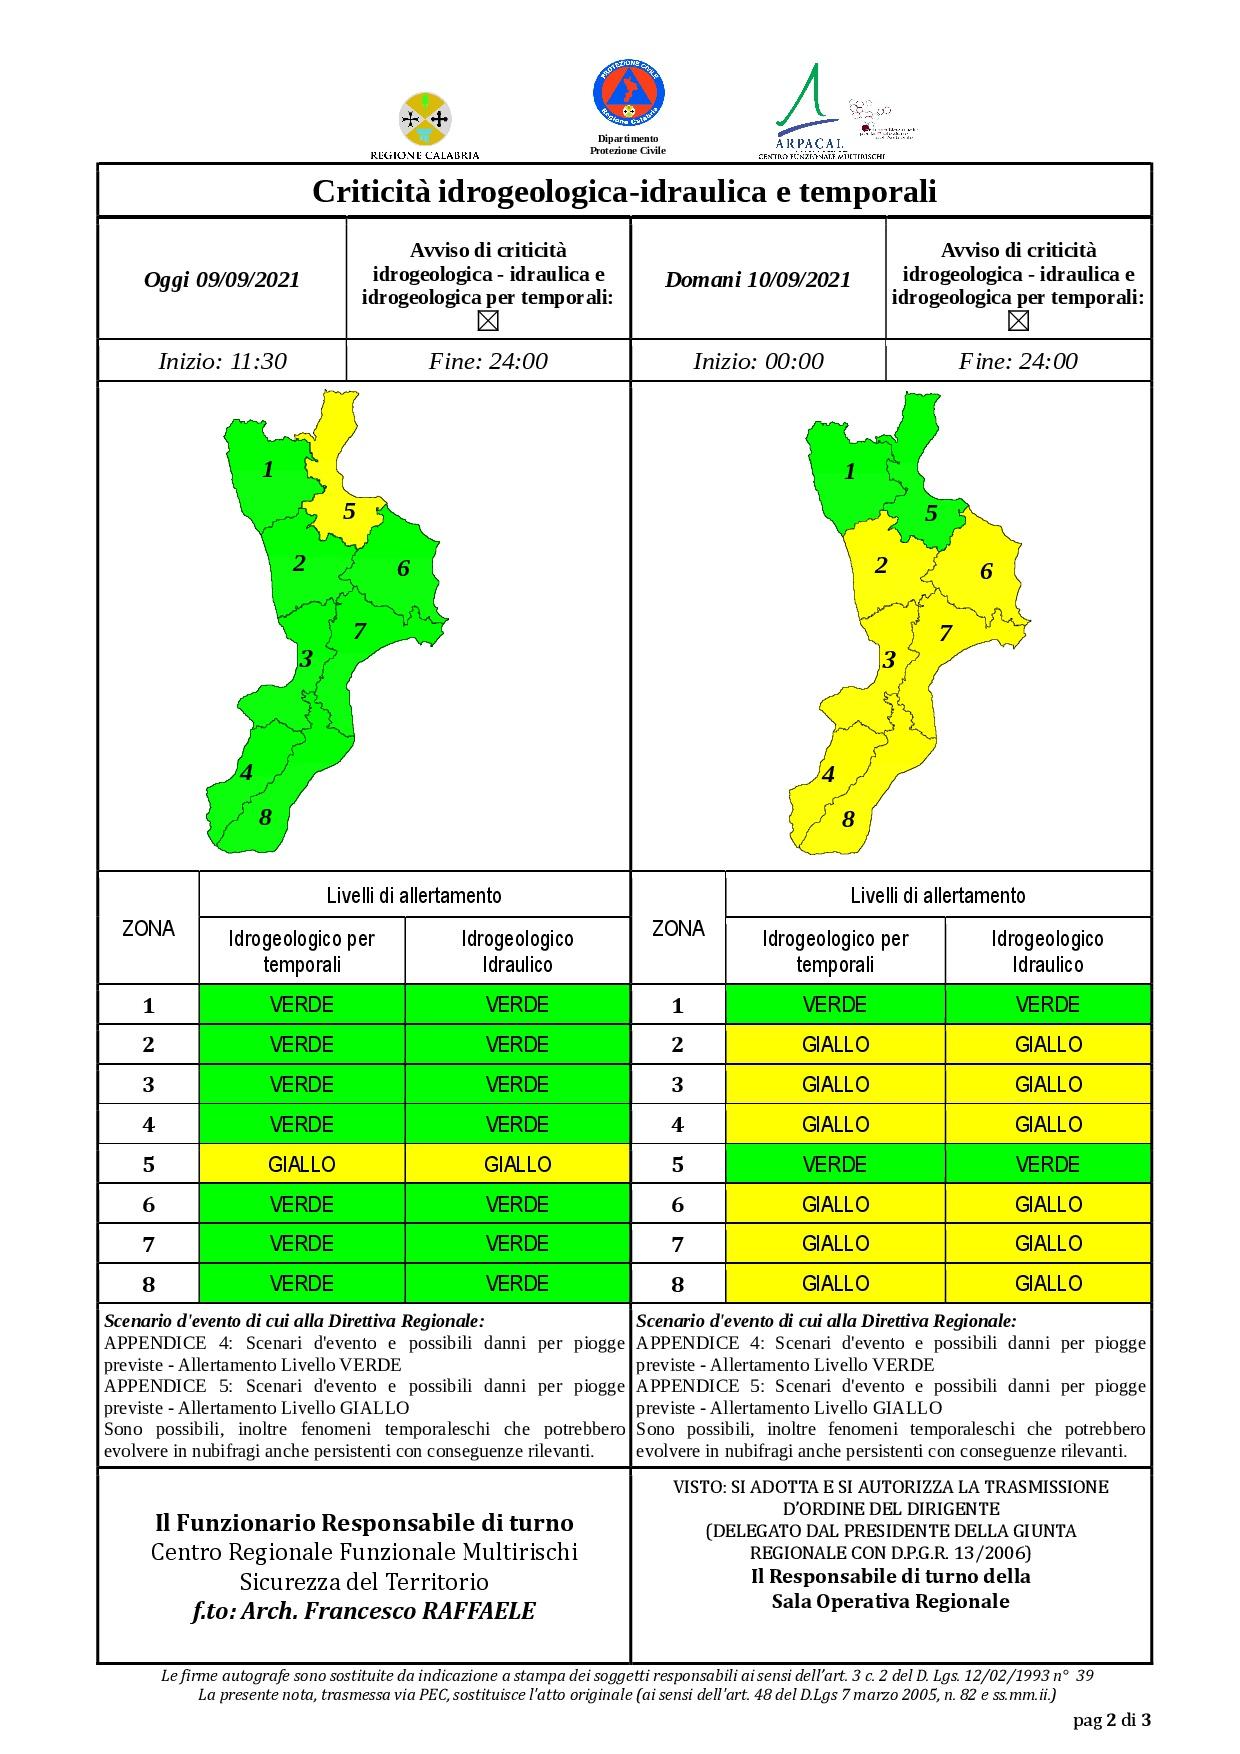 Criticità idrogeologica-idraulica e temporali in Calabria 09-09-2021